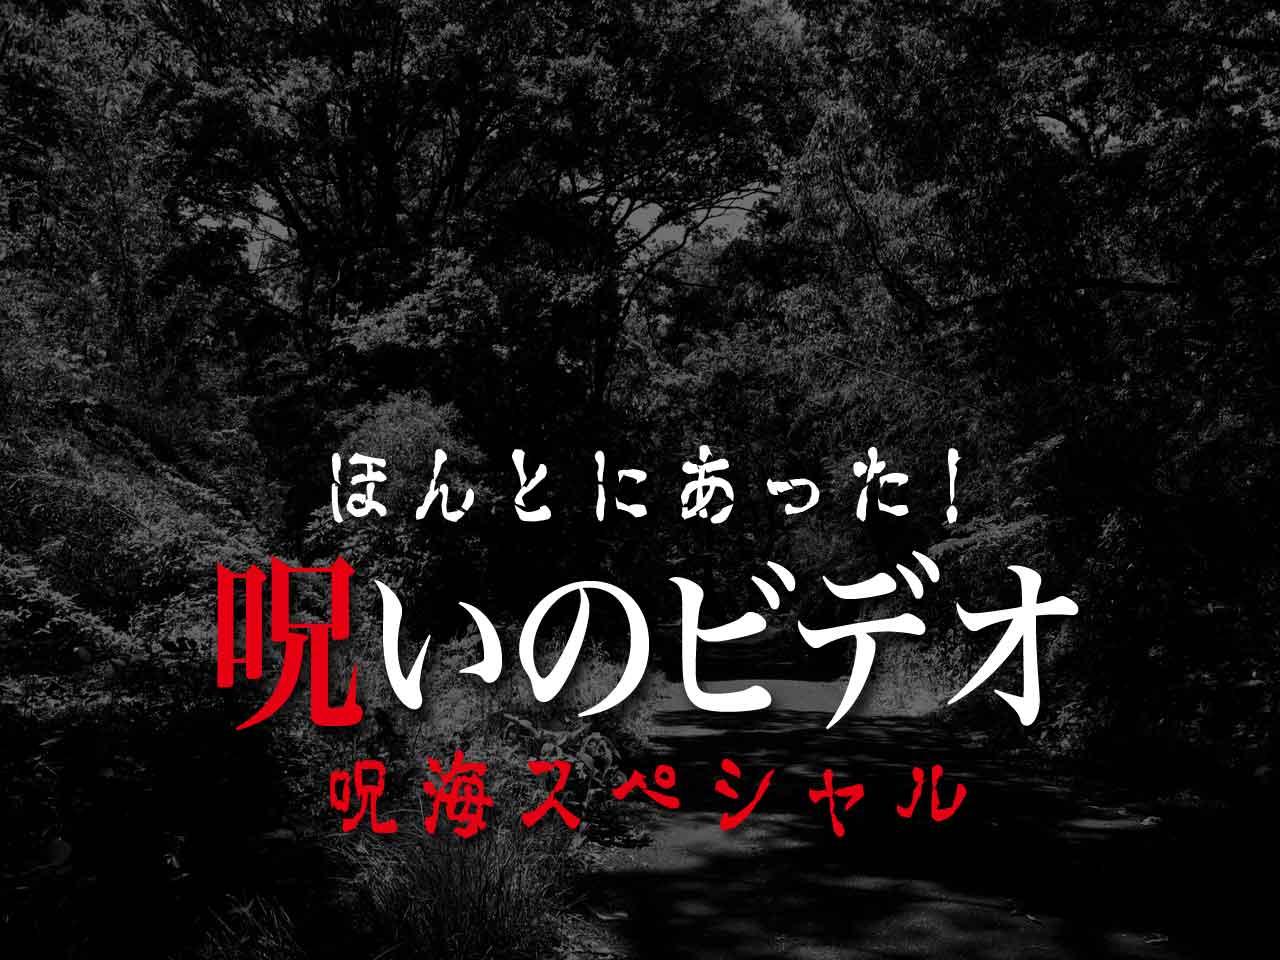 eye_catch_noro_jyukai